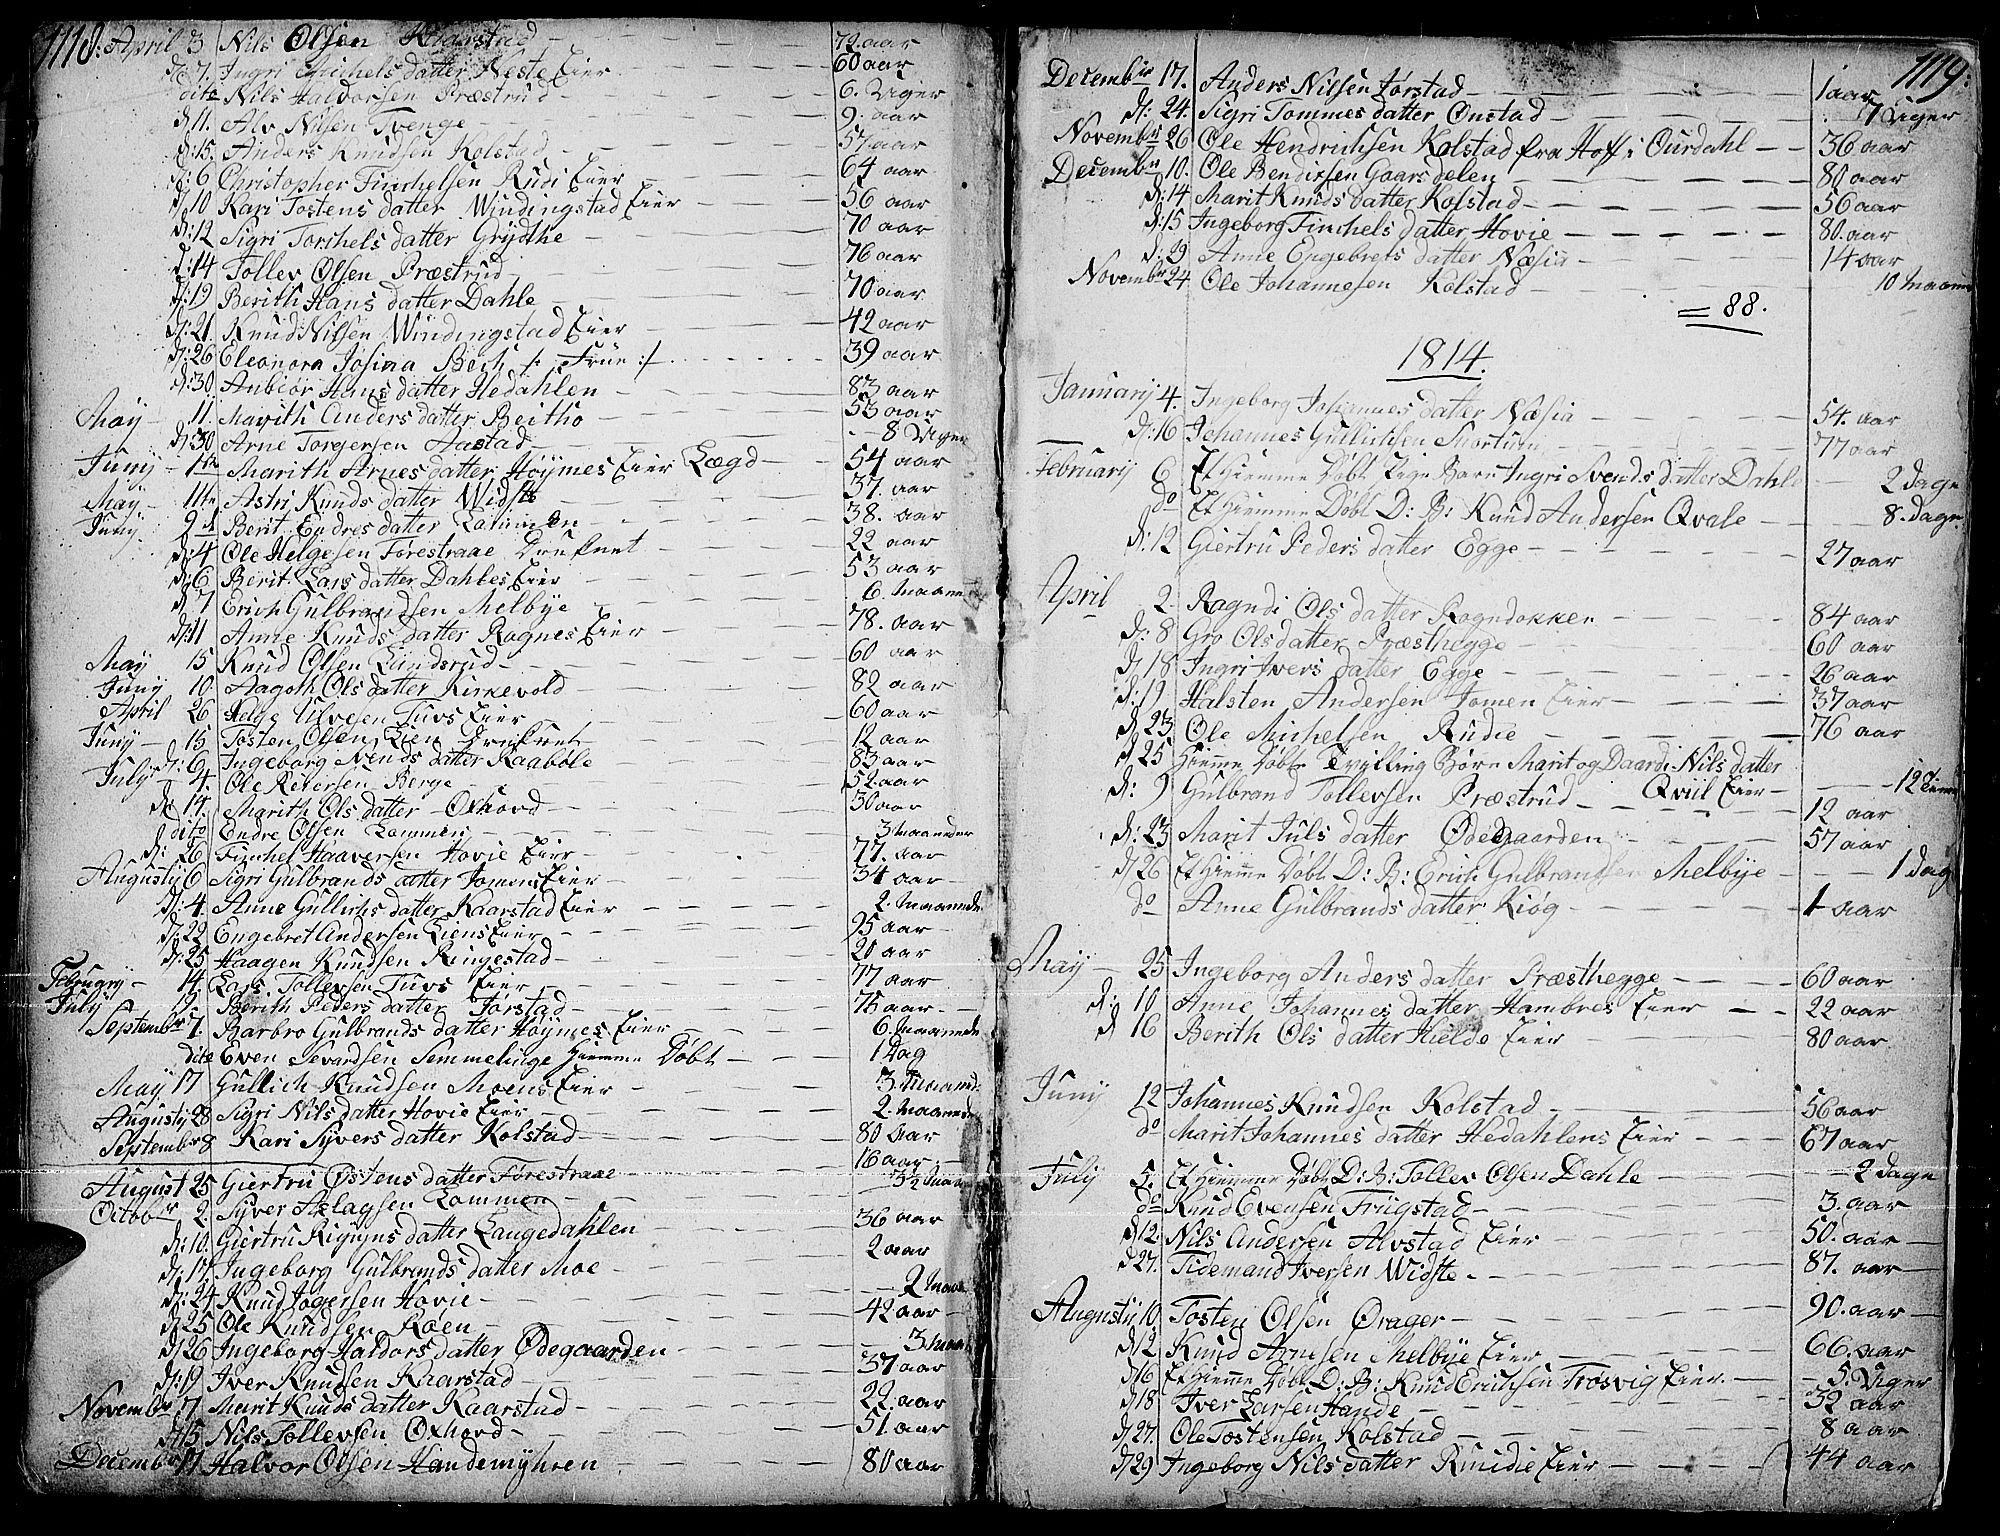 SAH, Slidre prestekontor, Parish register (official) no. 1, 1724-1814, p. 1118-1119